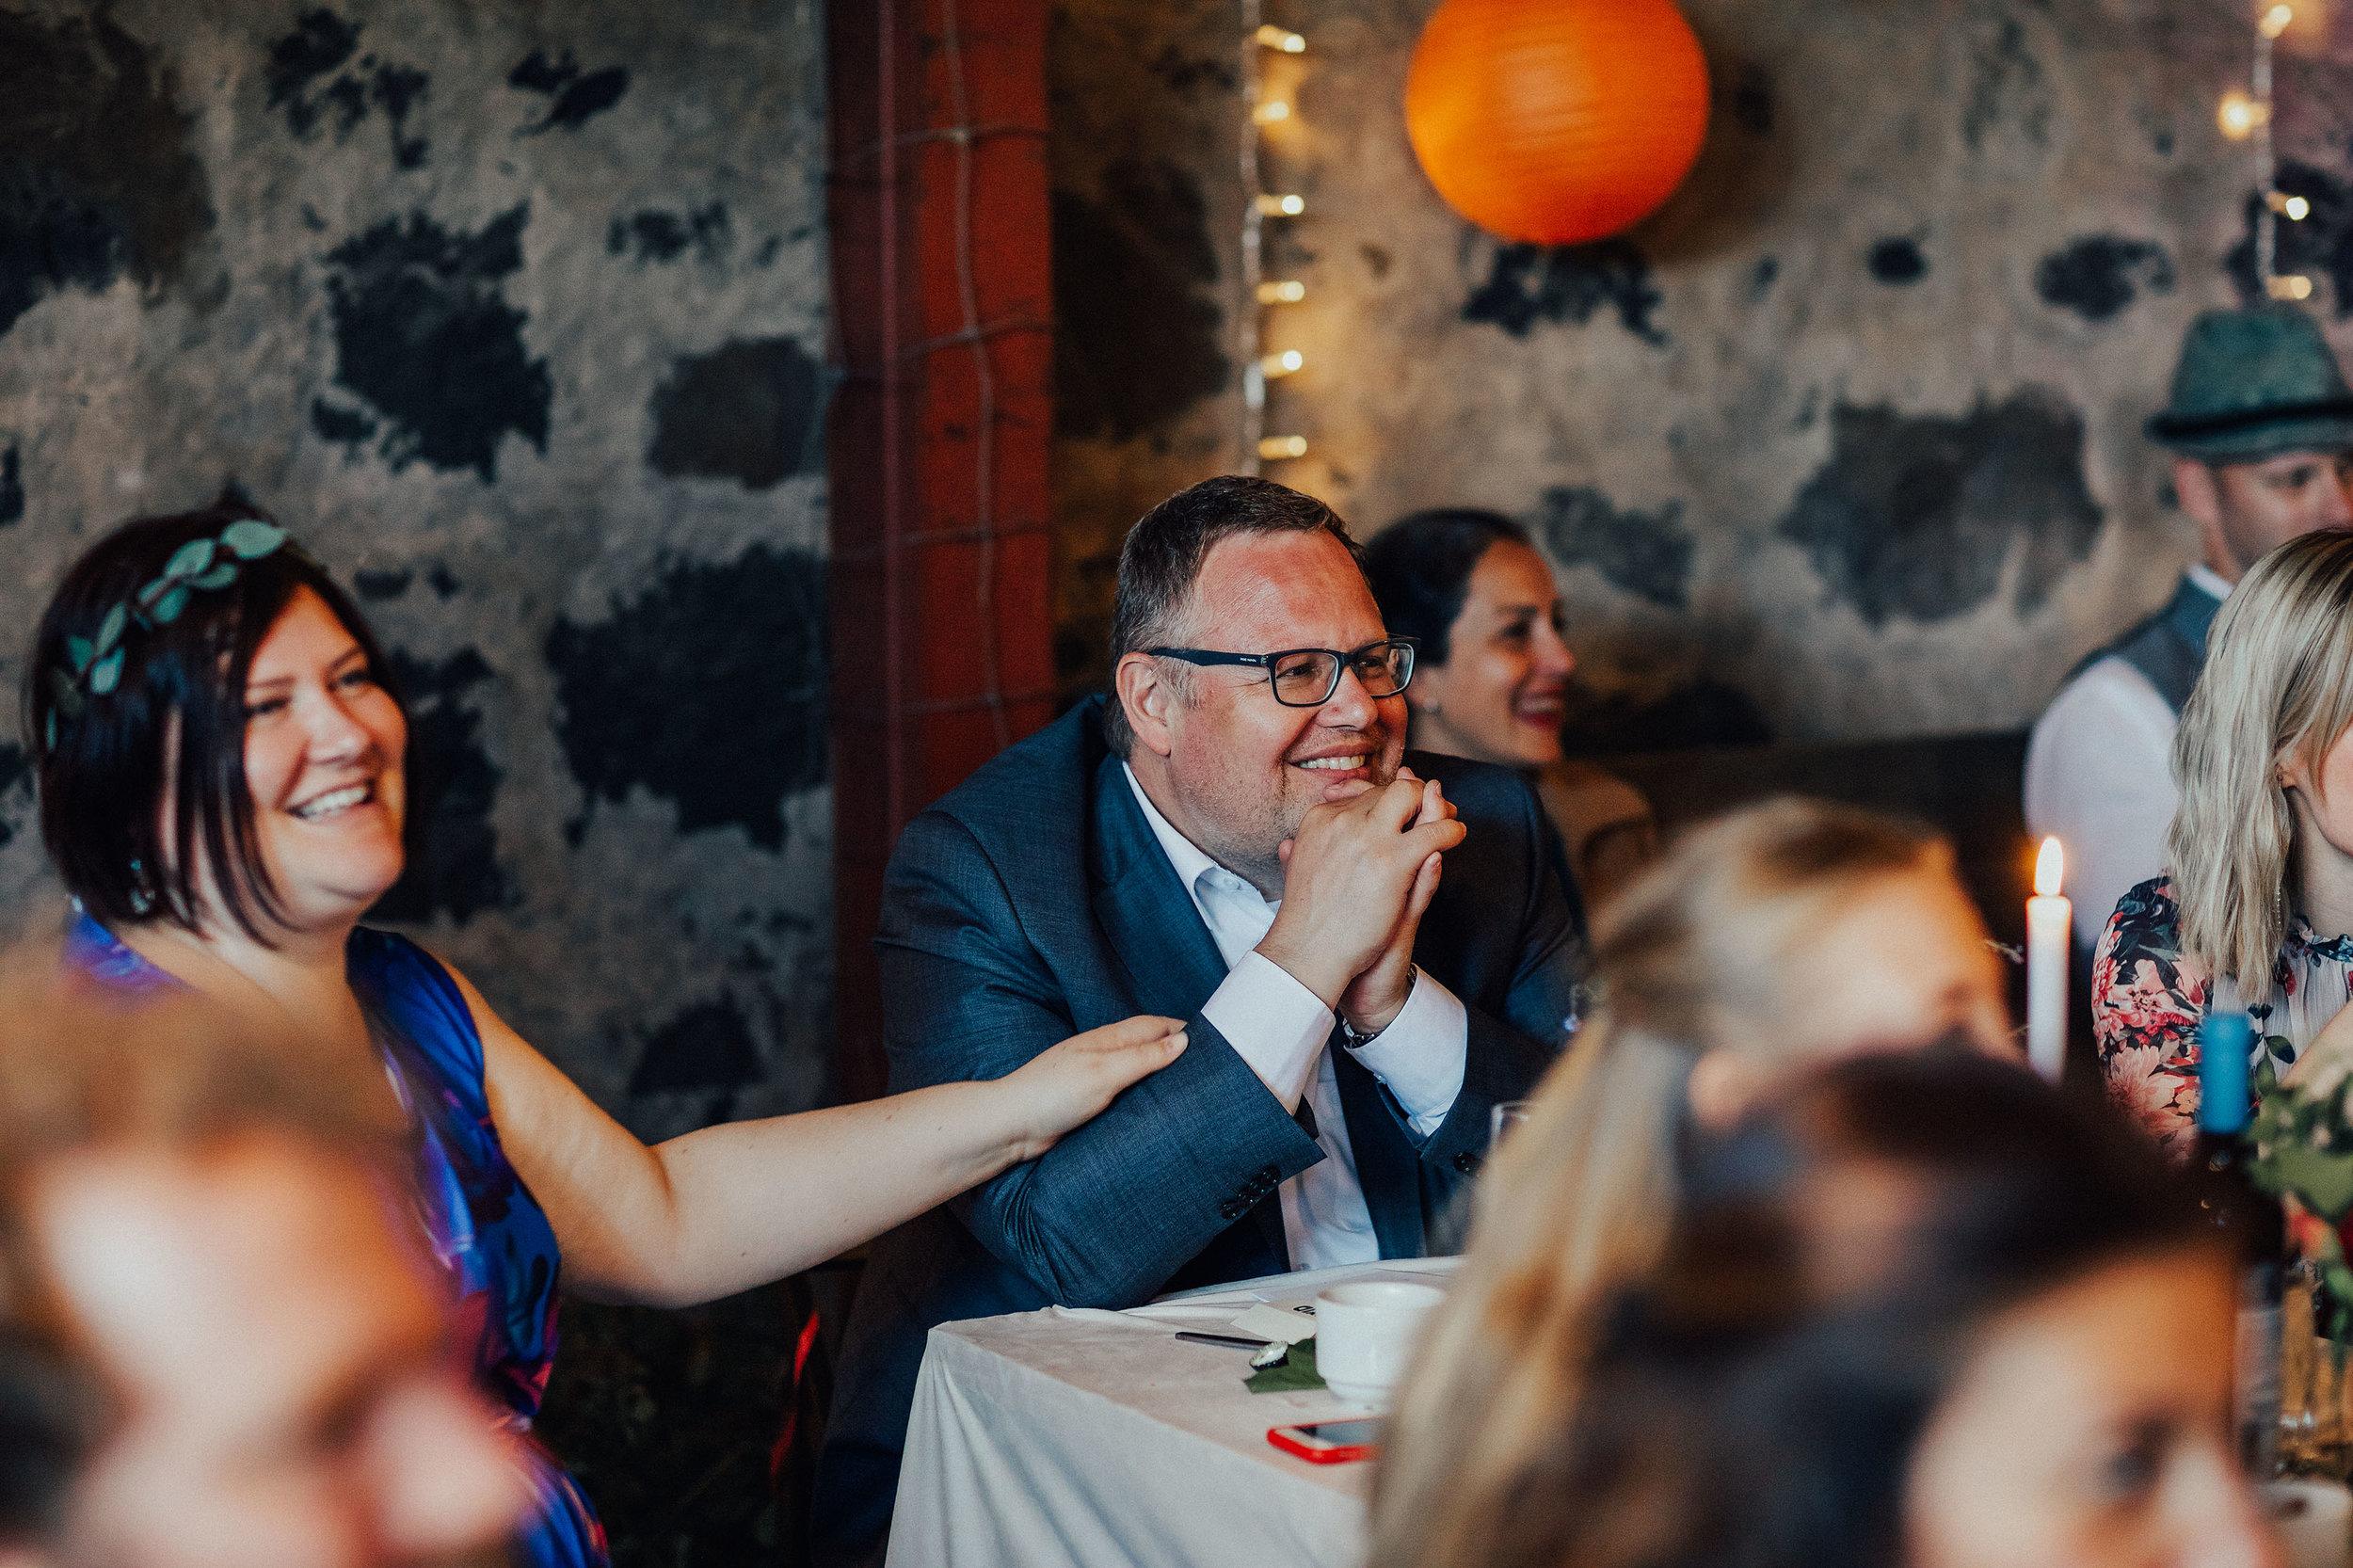 COMRIE_CROFT_WEDDINGS_PJ_PHILLIPS_PHOTOGRAPHY_154.jpg